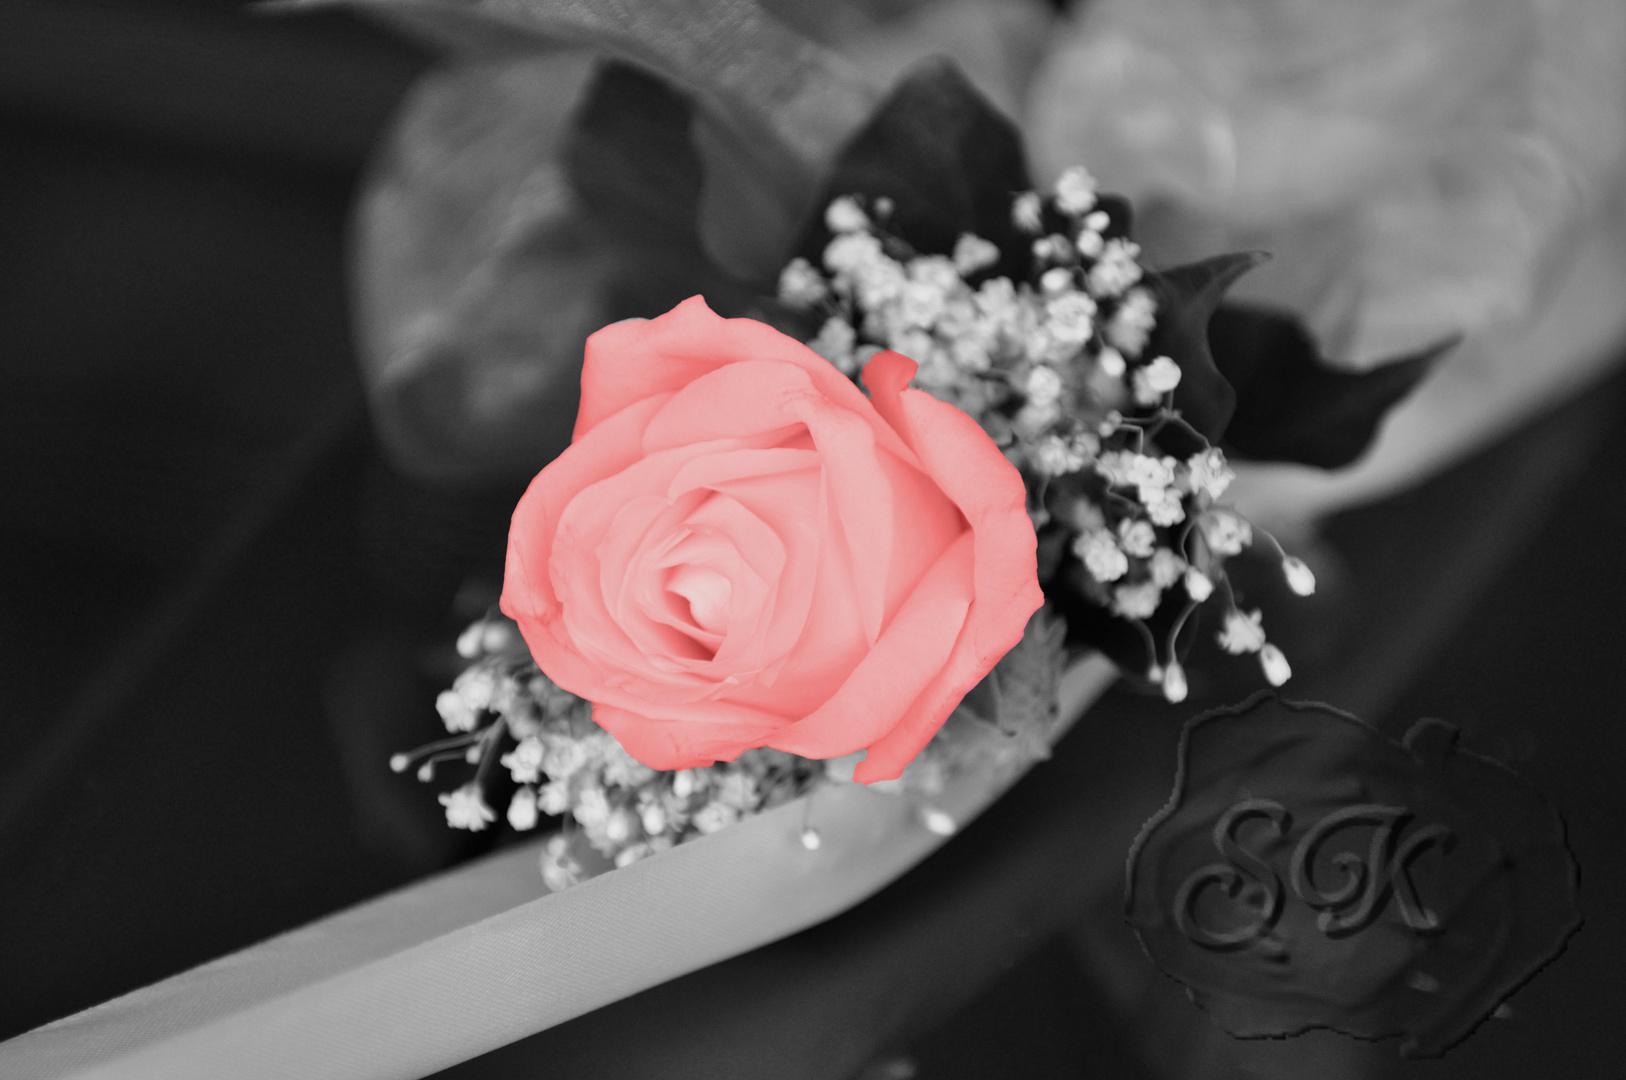 rose schwarz wei und doch farbe foto bild pflanzen pilze flechten bl ten. Black Bedroom Furniture Sets. Home Design Ideas